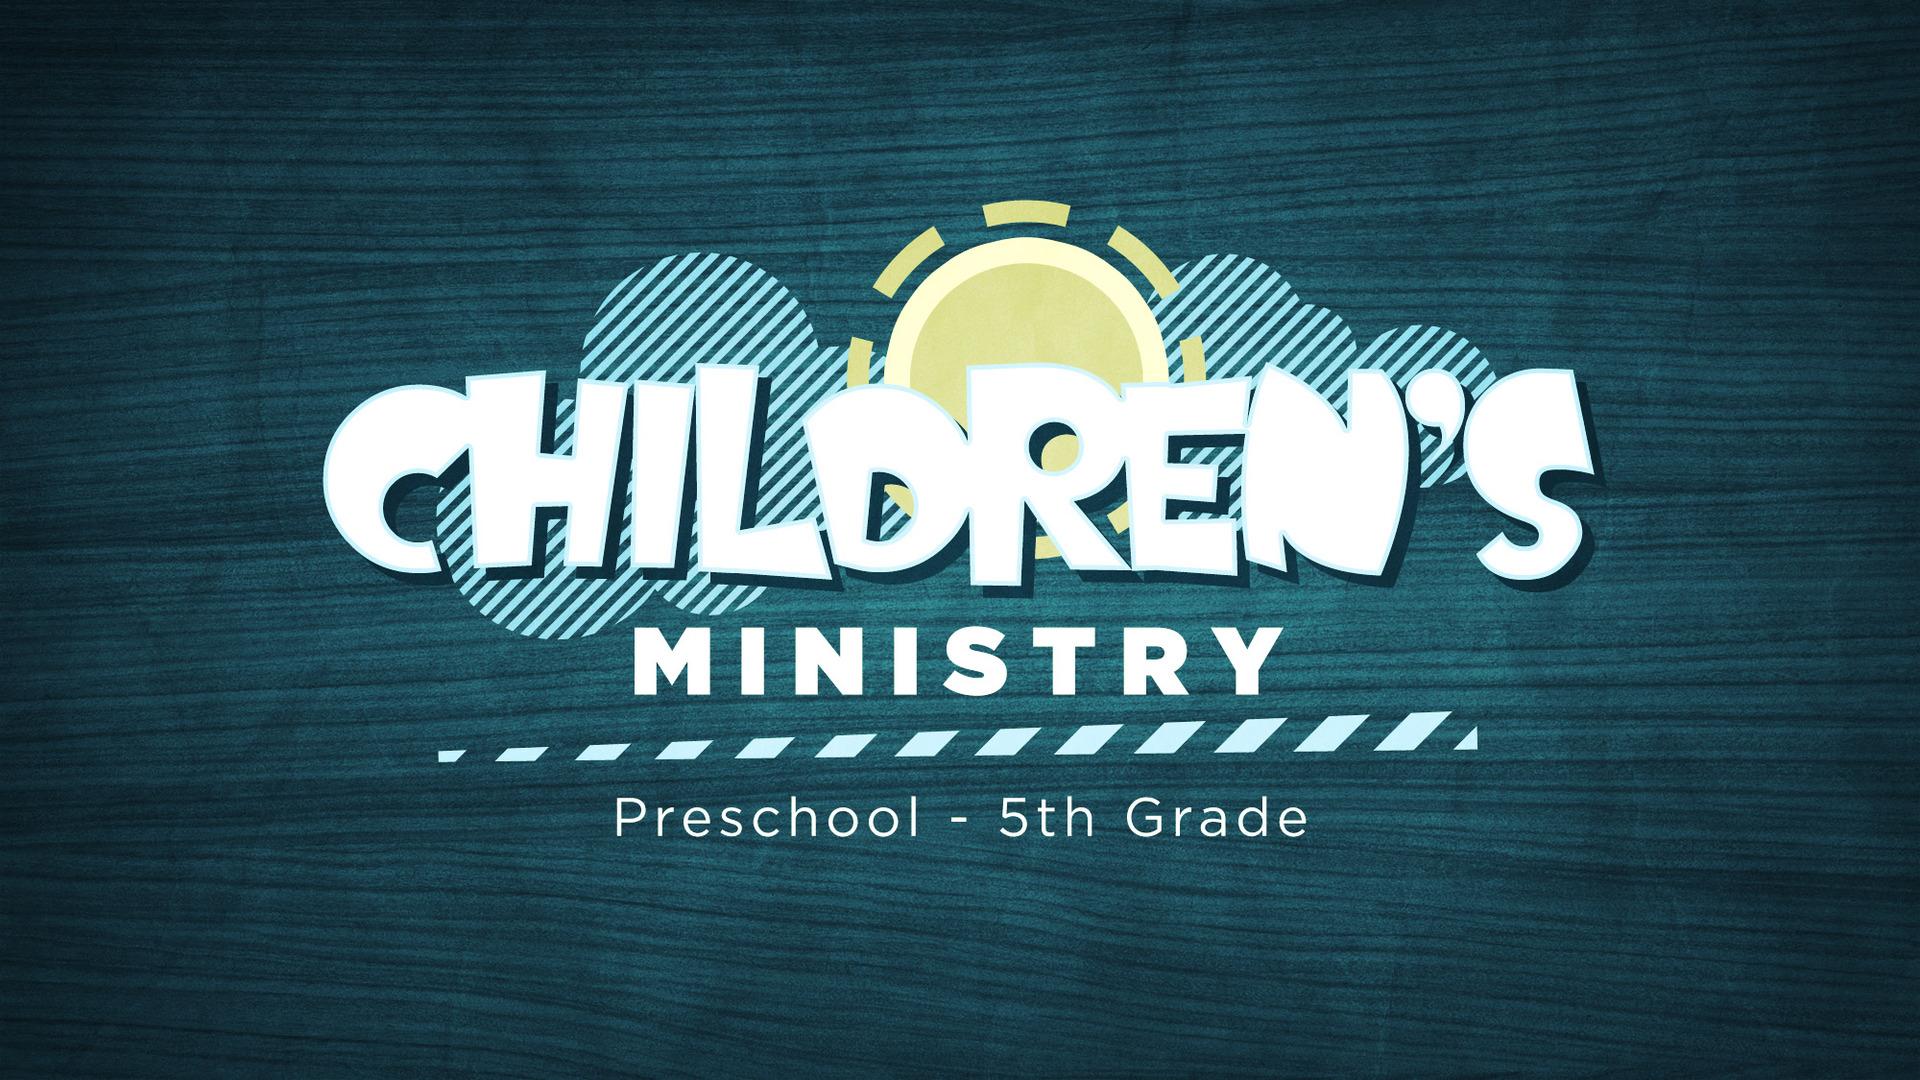 cartoon_clouds_children_s_ministry-title-1-still-16x9.jpg